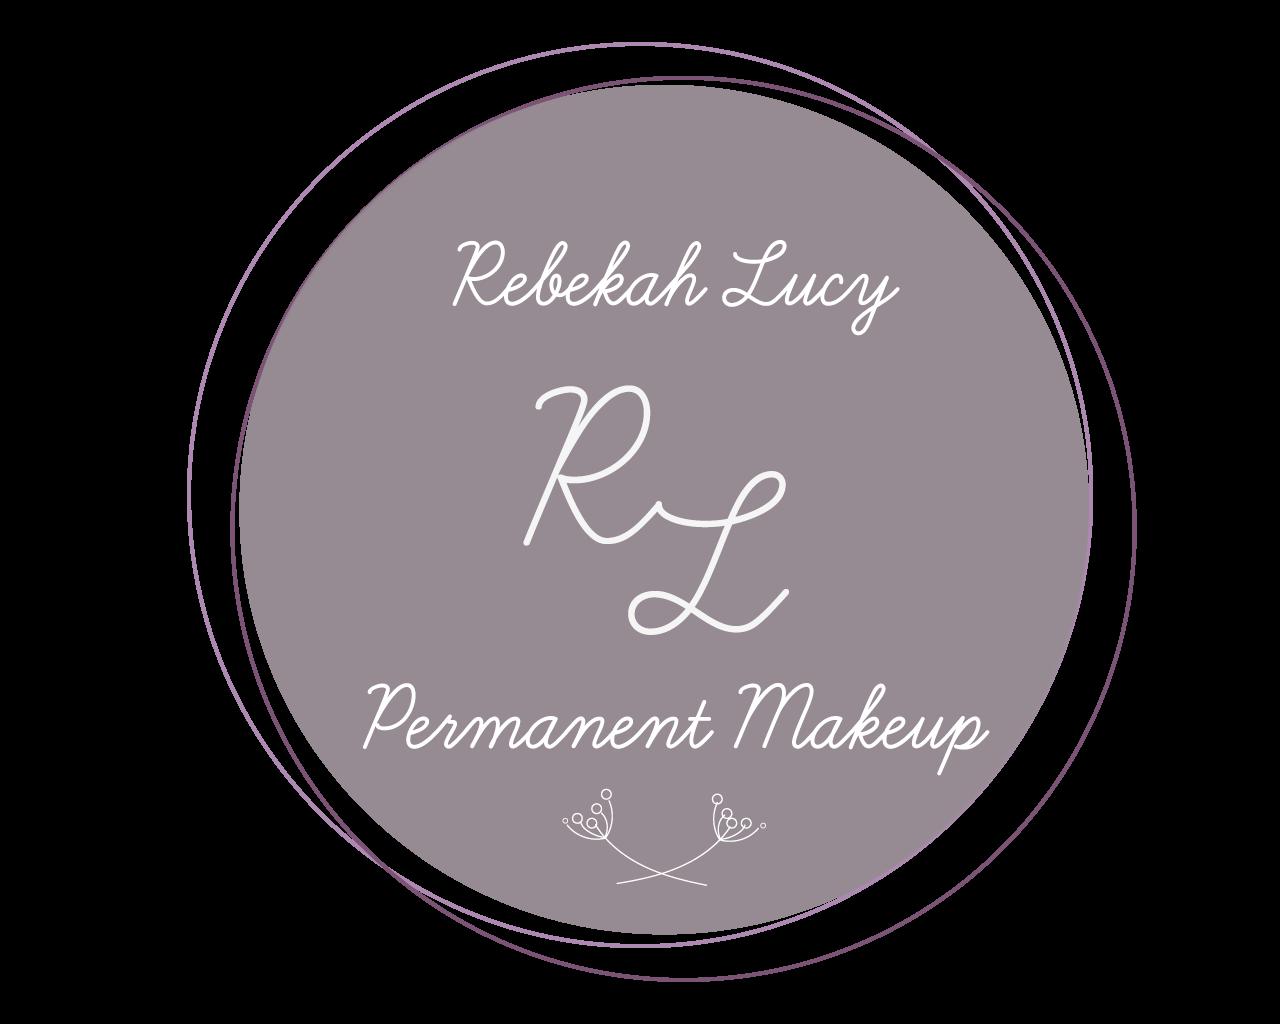 Rebekah Lucy Permanent Makeup